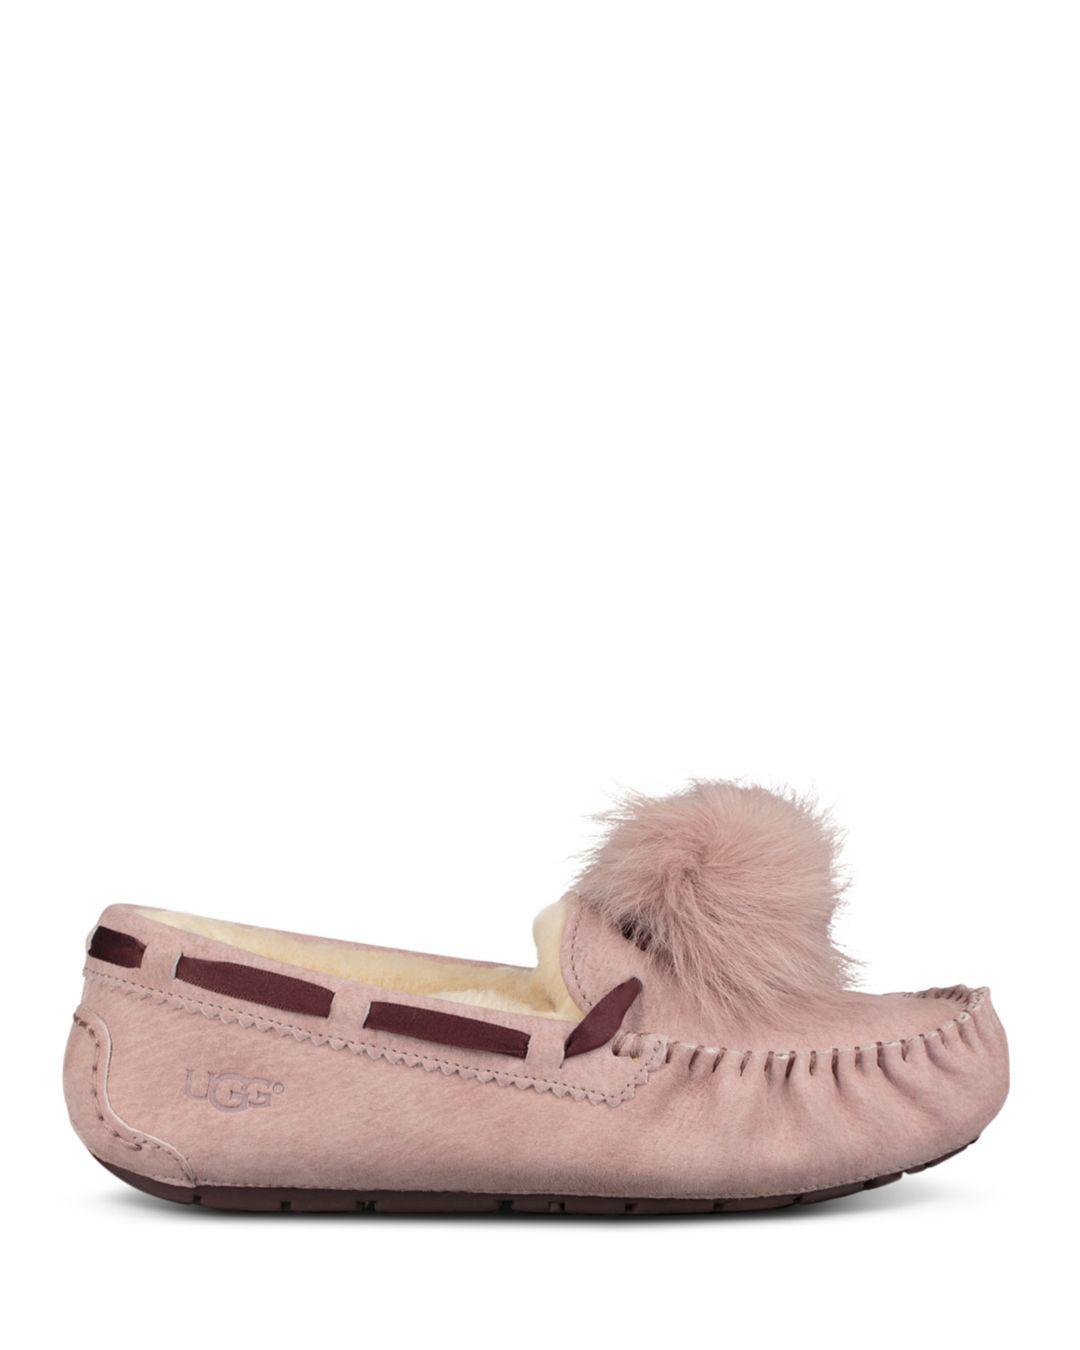 bd159dfb2d Lyst - UGG Women s Dakota Fur Pom-pom Suede Loafers - Chestnut - Size 9 in  Pink - Save 47%